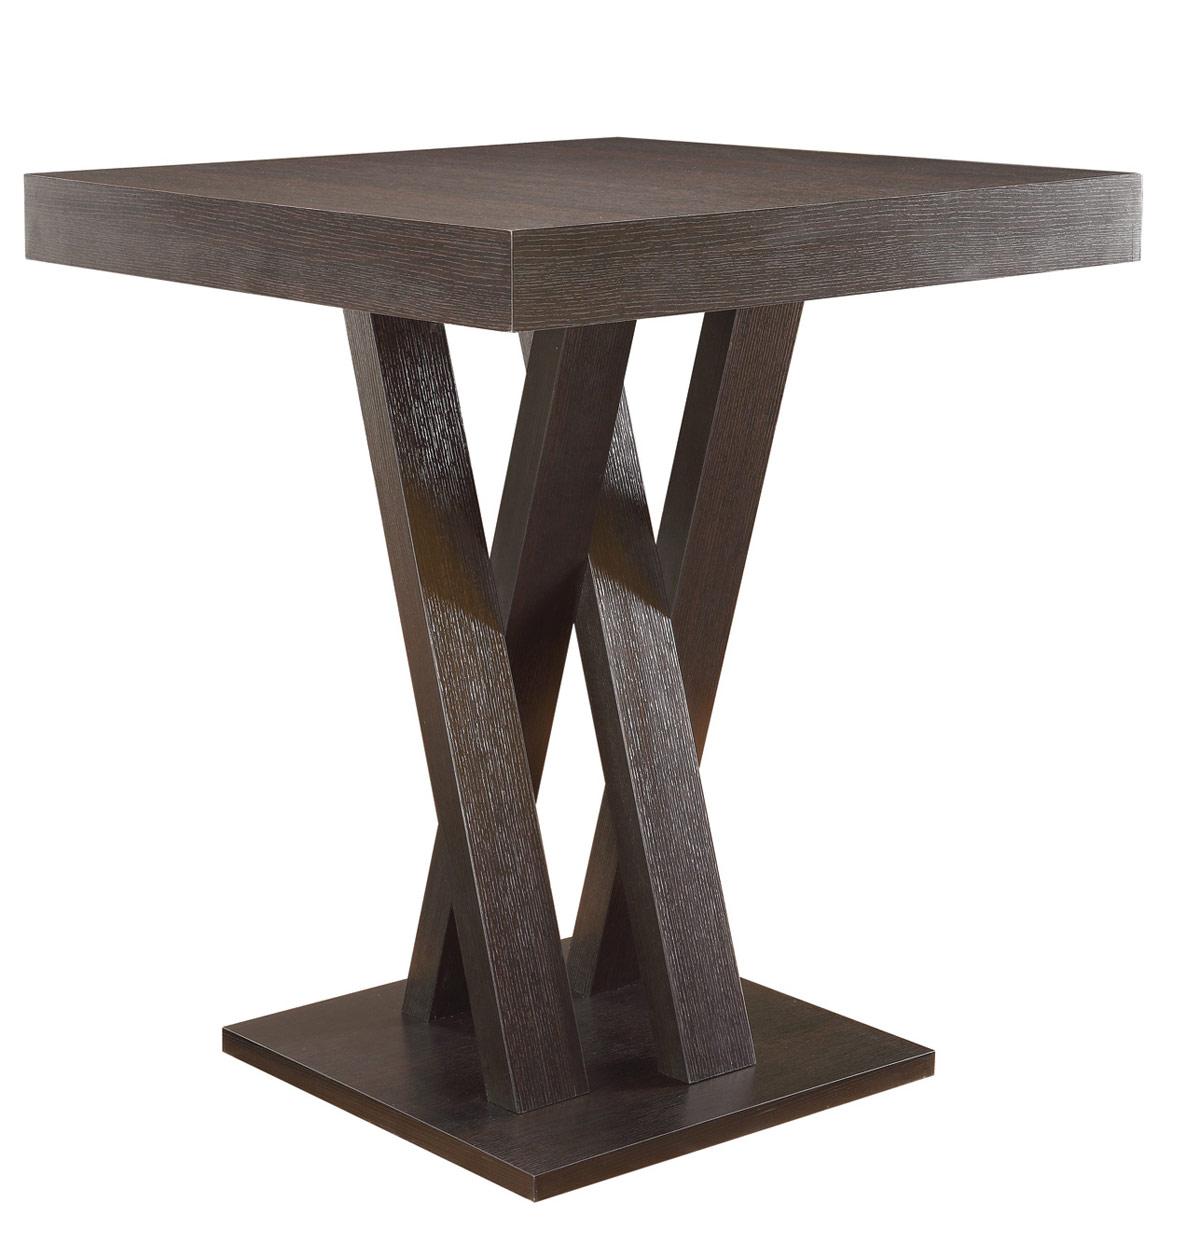 Superieur Coaster 100523 Counter Height Table   Cappuccino